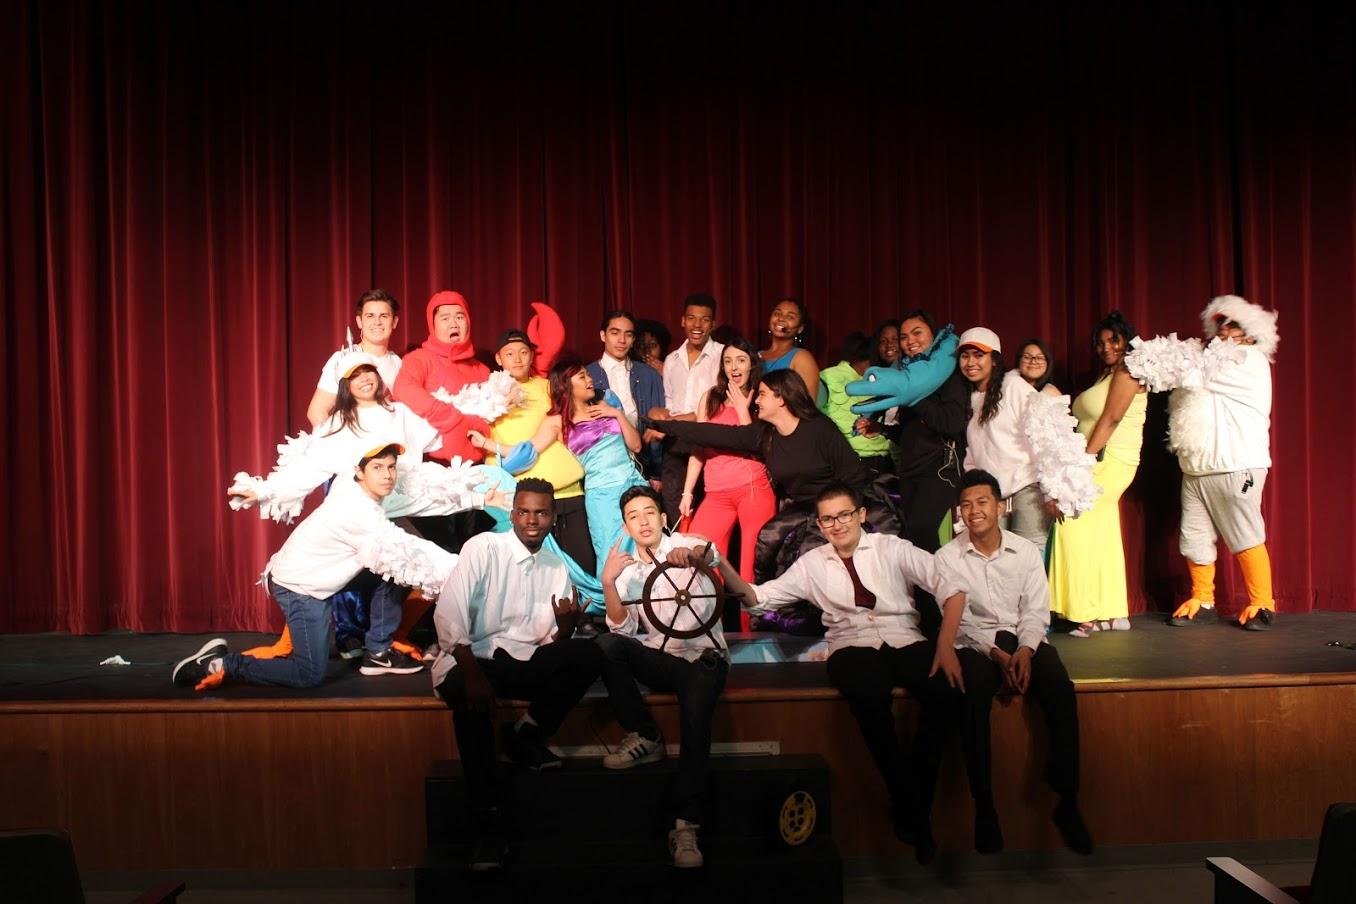 Weston+Ranch+High+School+Performing+Arts+presents+Disney%27s+%22The+Little+Mermaid%22